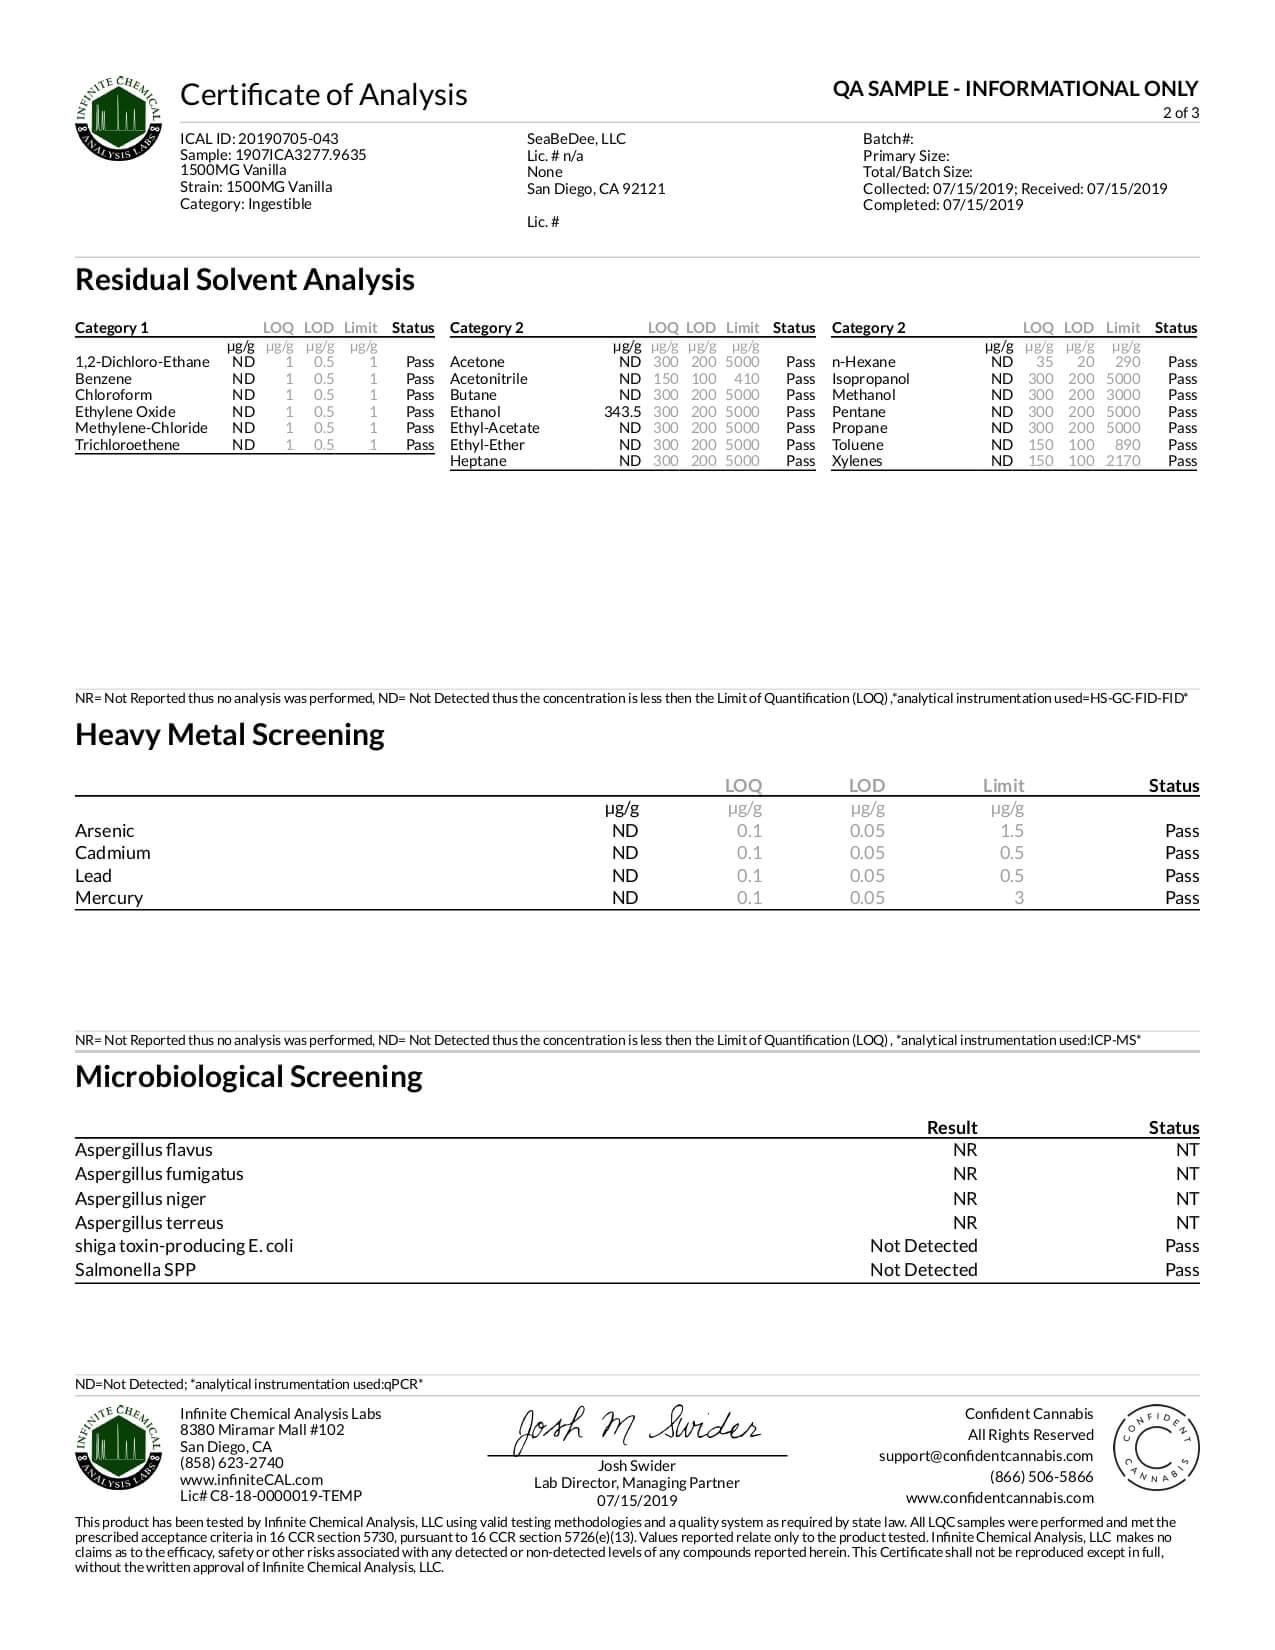 Seabedee CBD Tincture Full Spectrum Vanilla 1500mg Lab Report